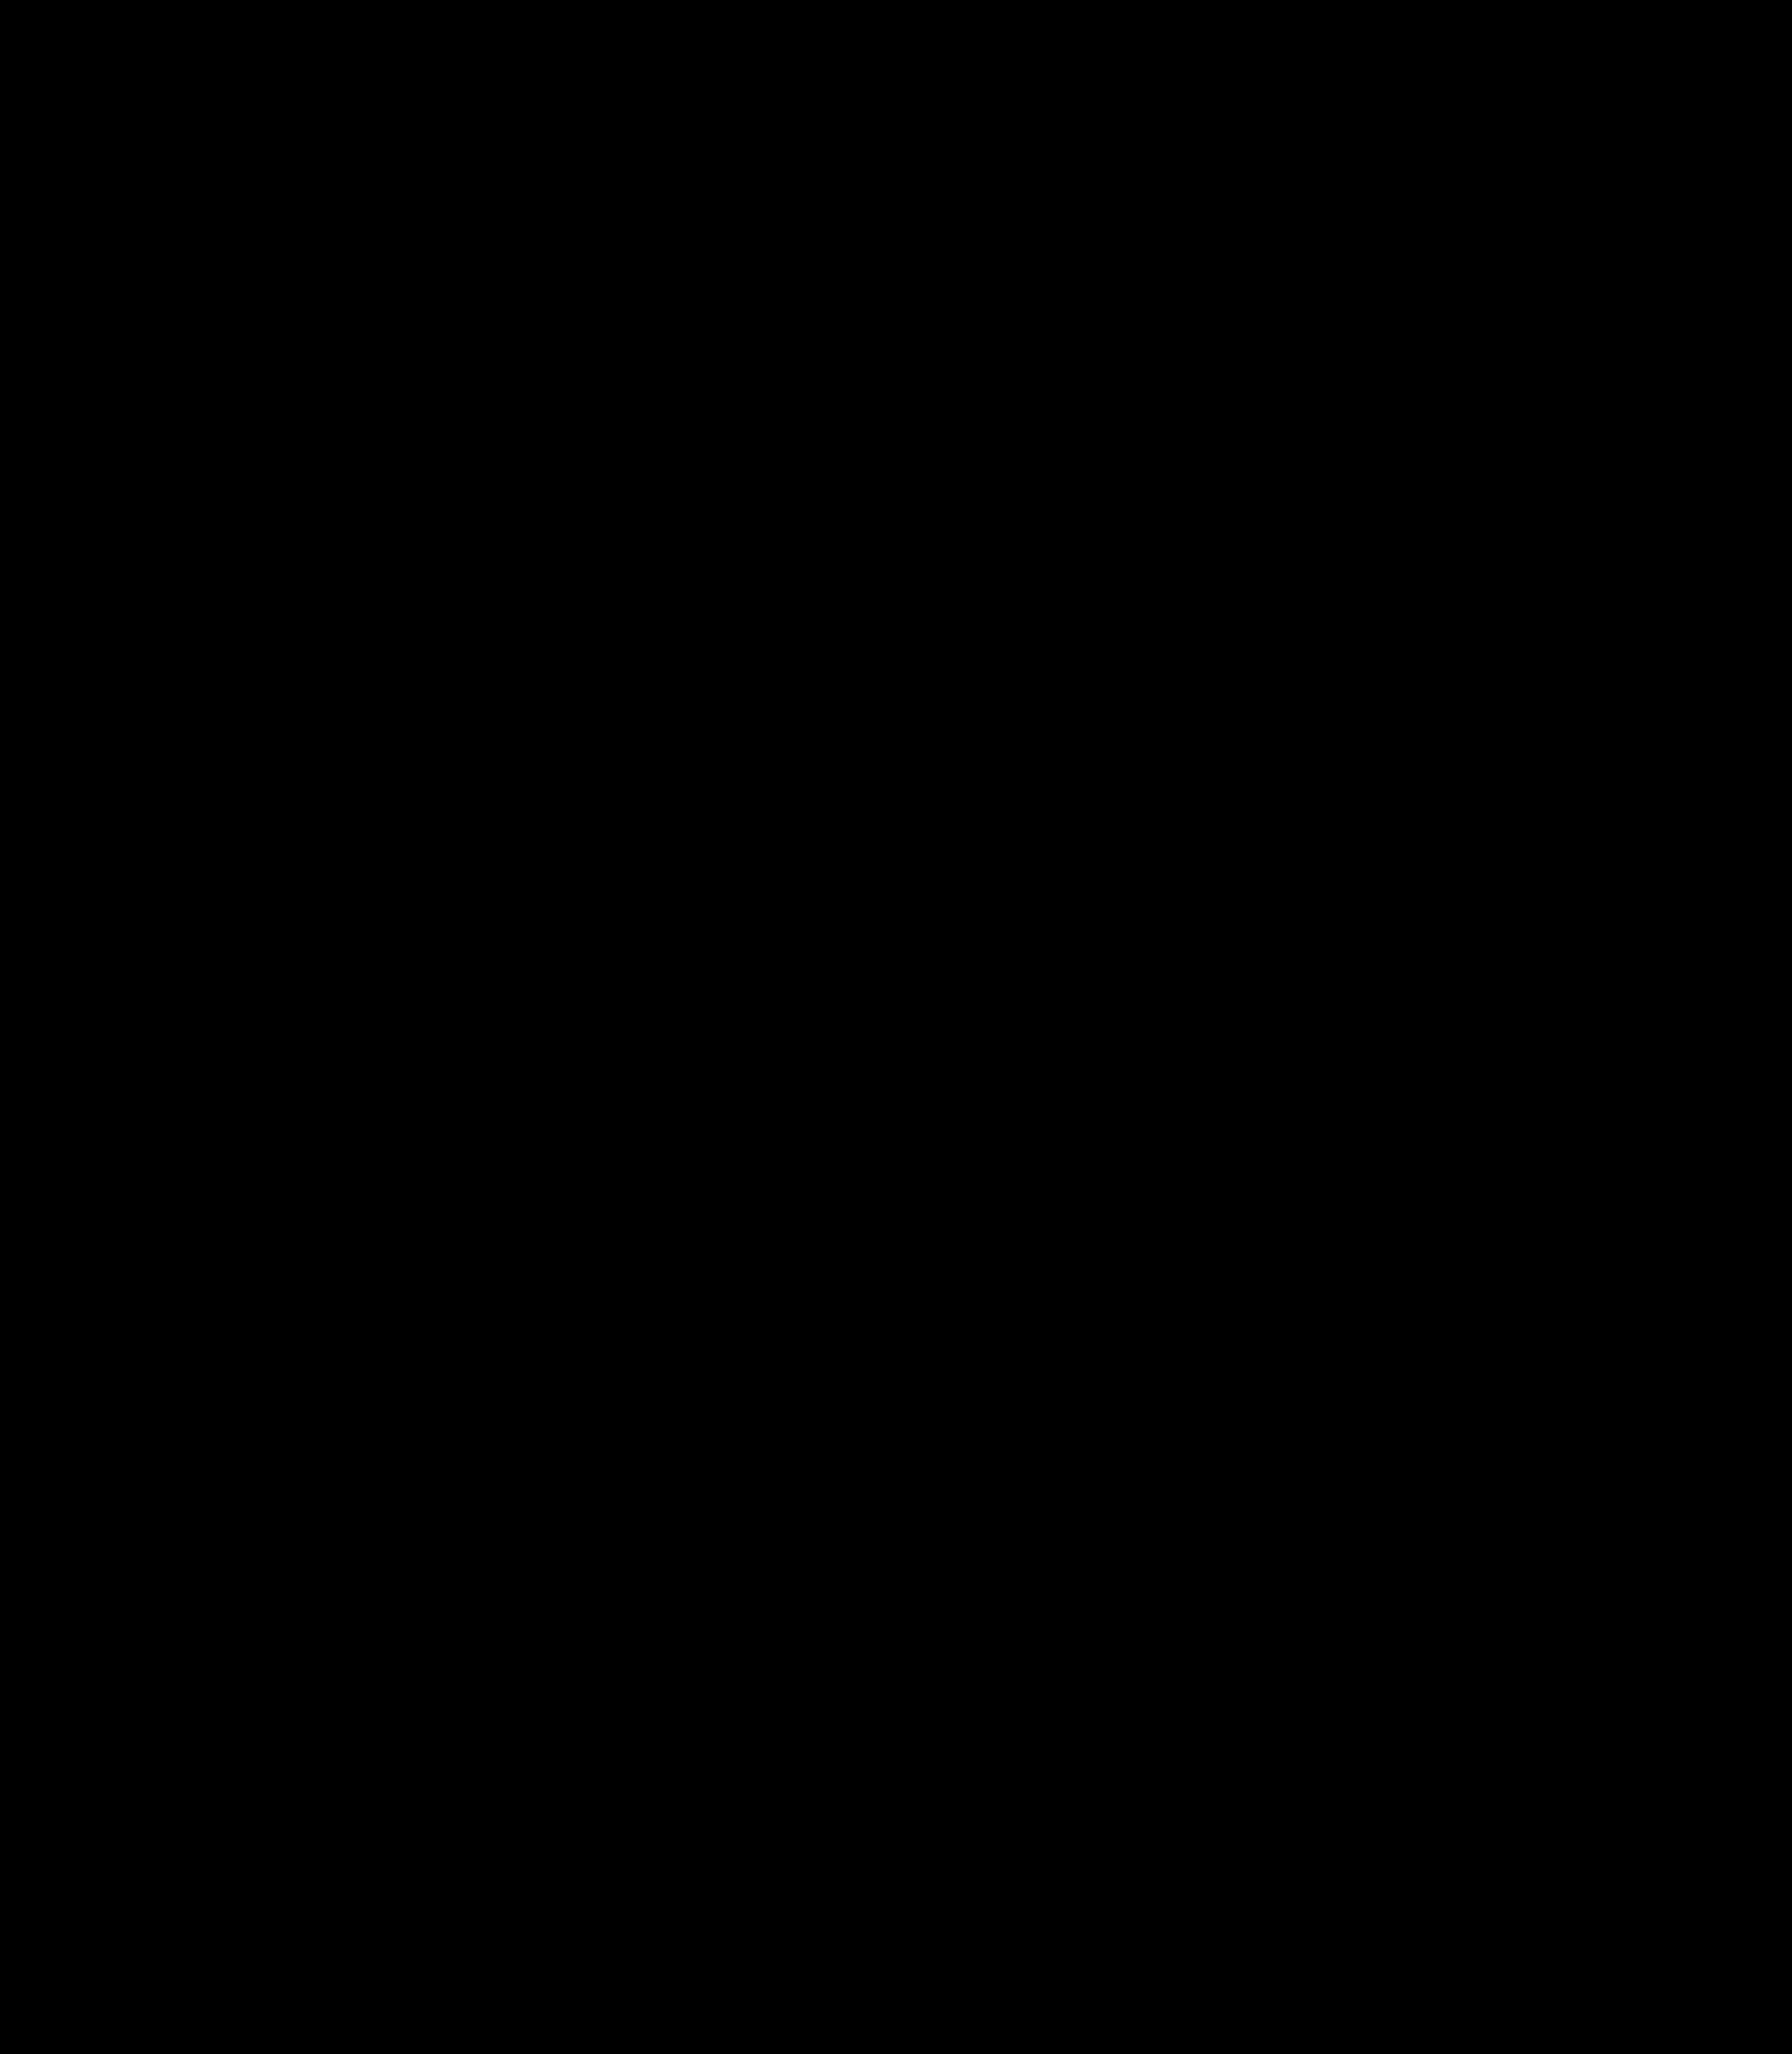 2094x2400 Clipart